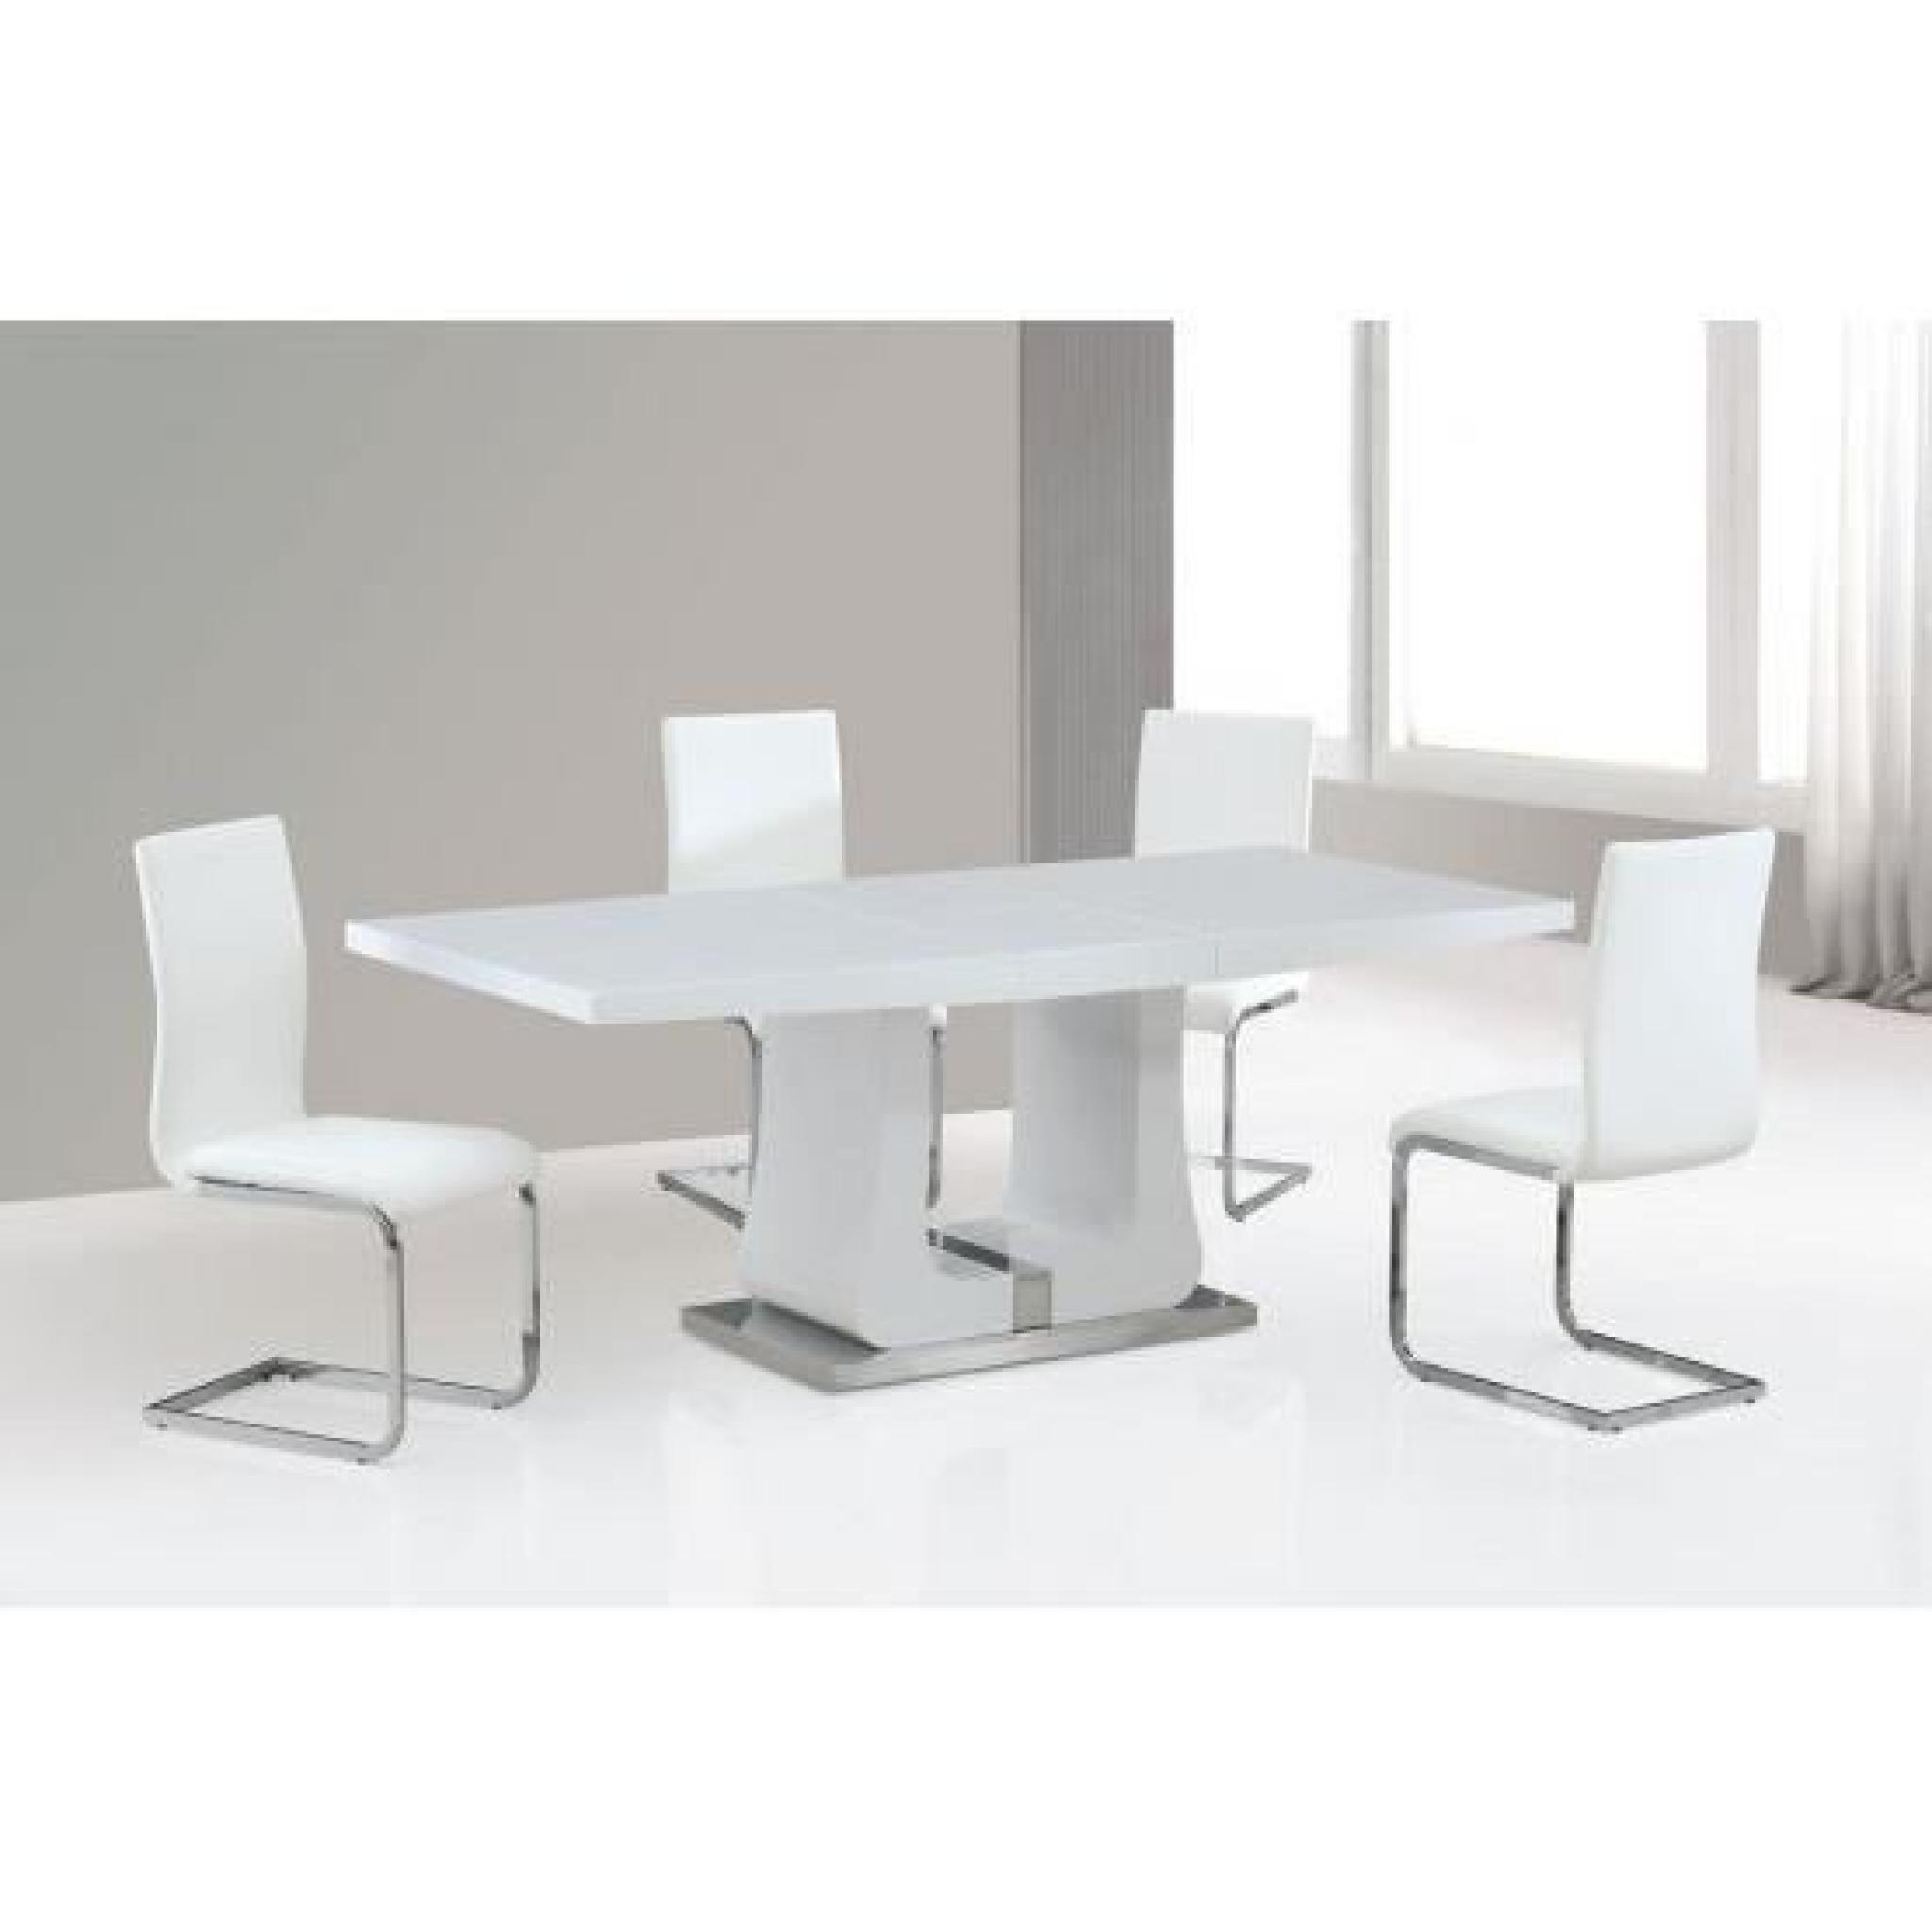 Table design Cinthia blanc - Achat/Vente table salle a manger pas ...